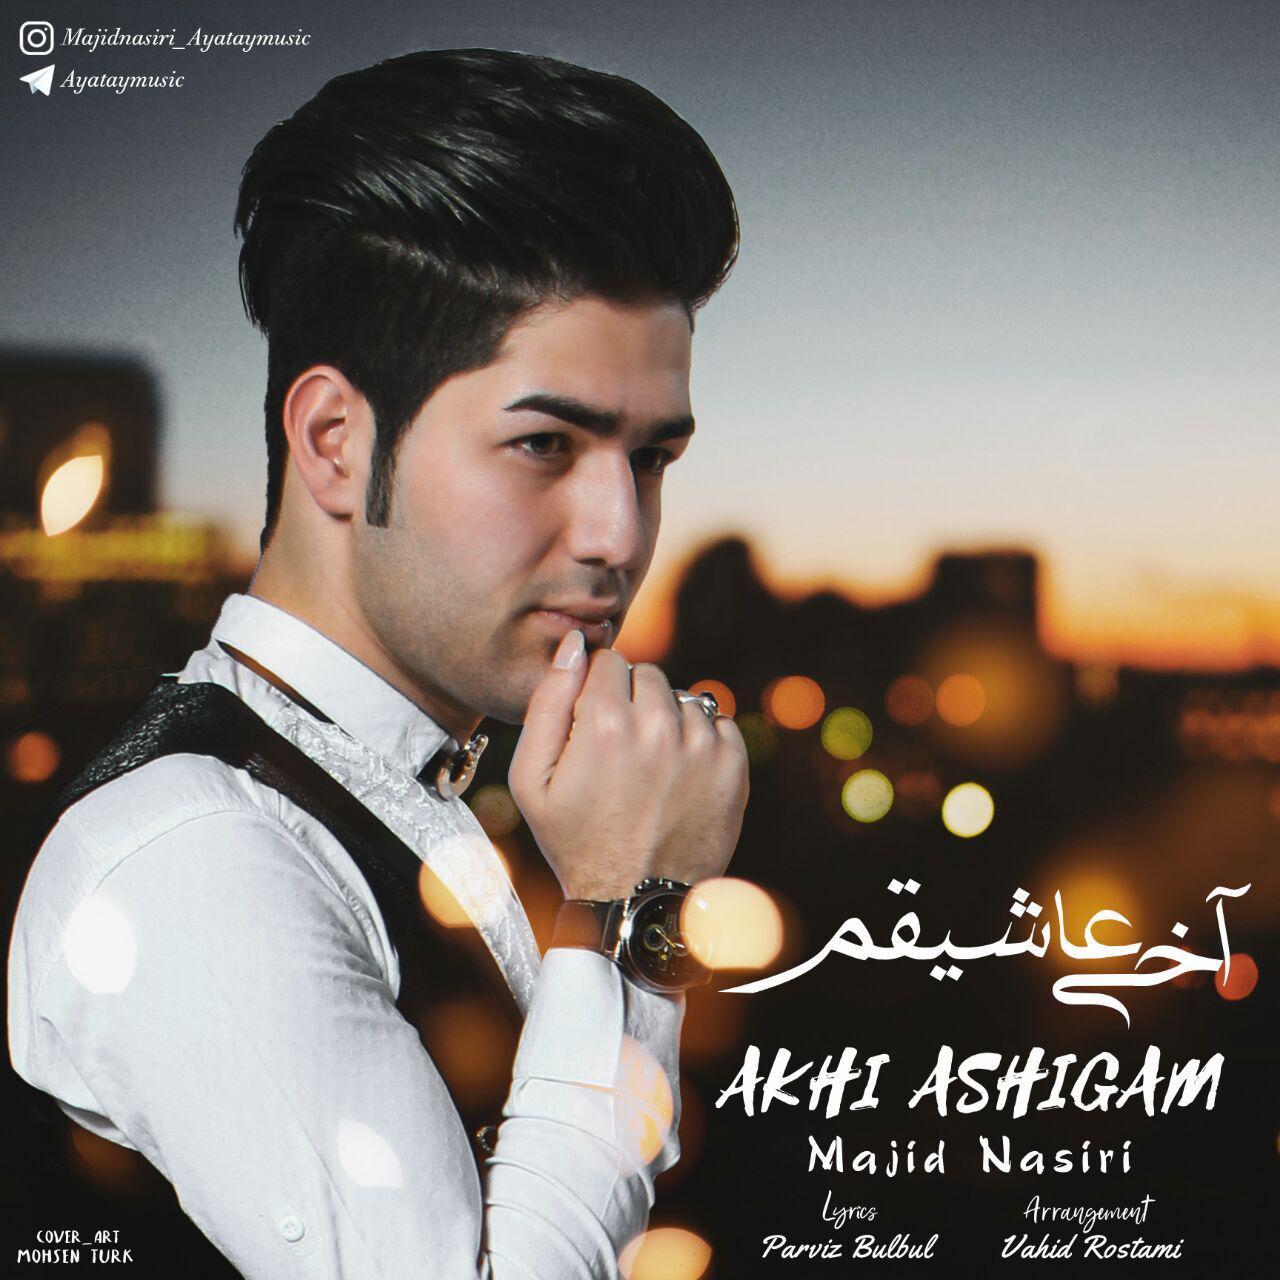 http://s9.picofile.com/file/8337161318/15Majid_Nasiri_Akhi_Ashigham.jpg